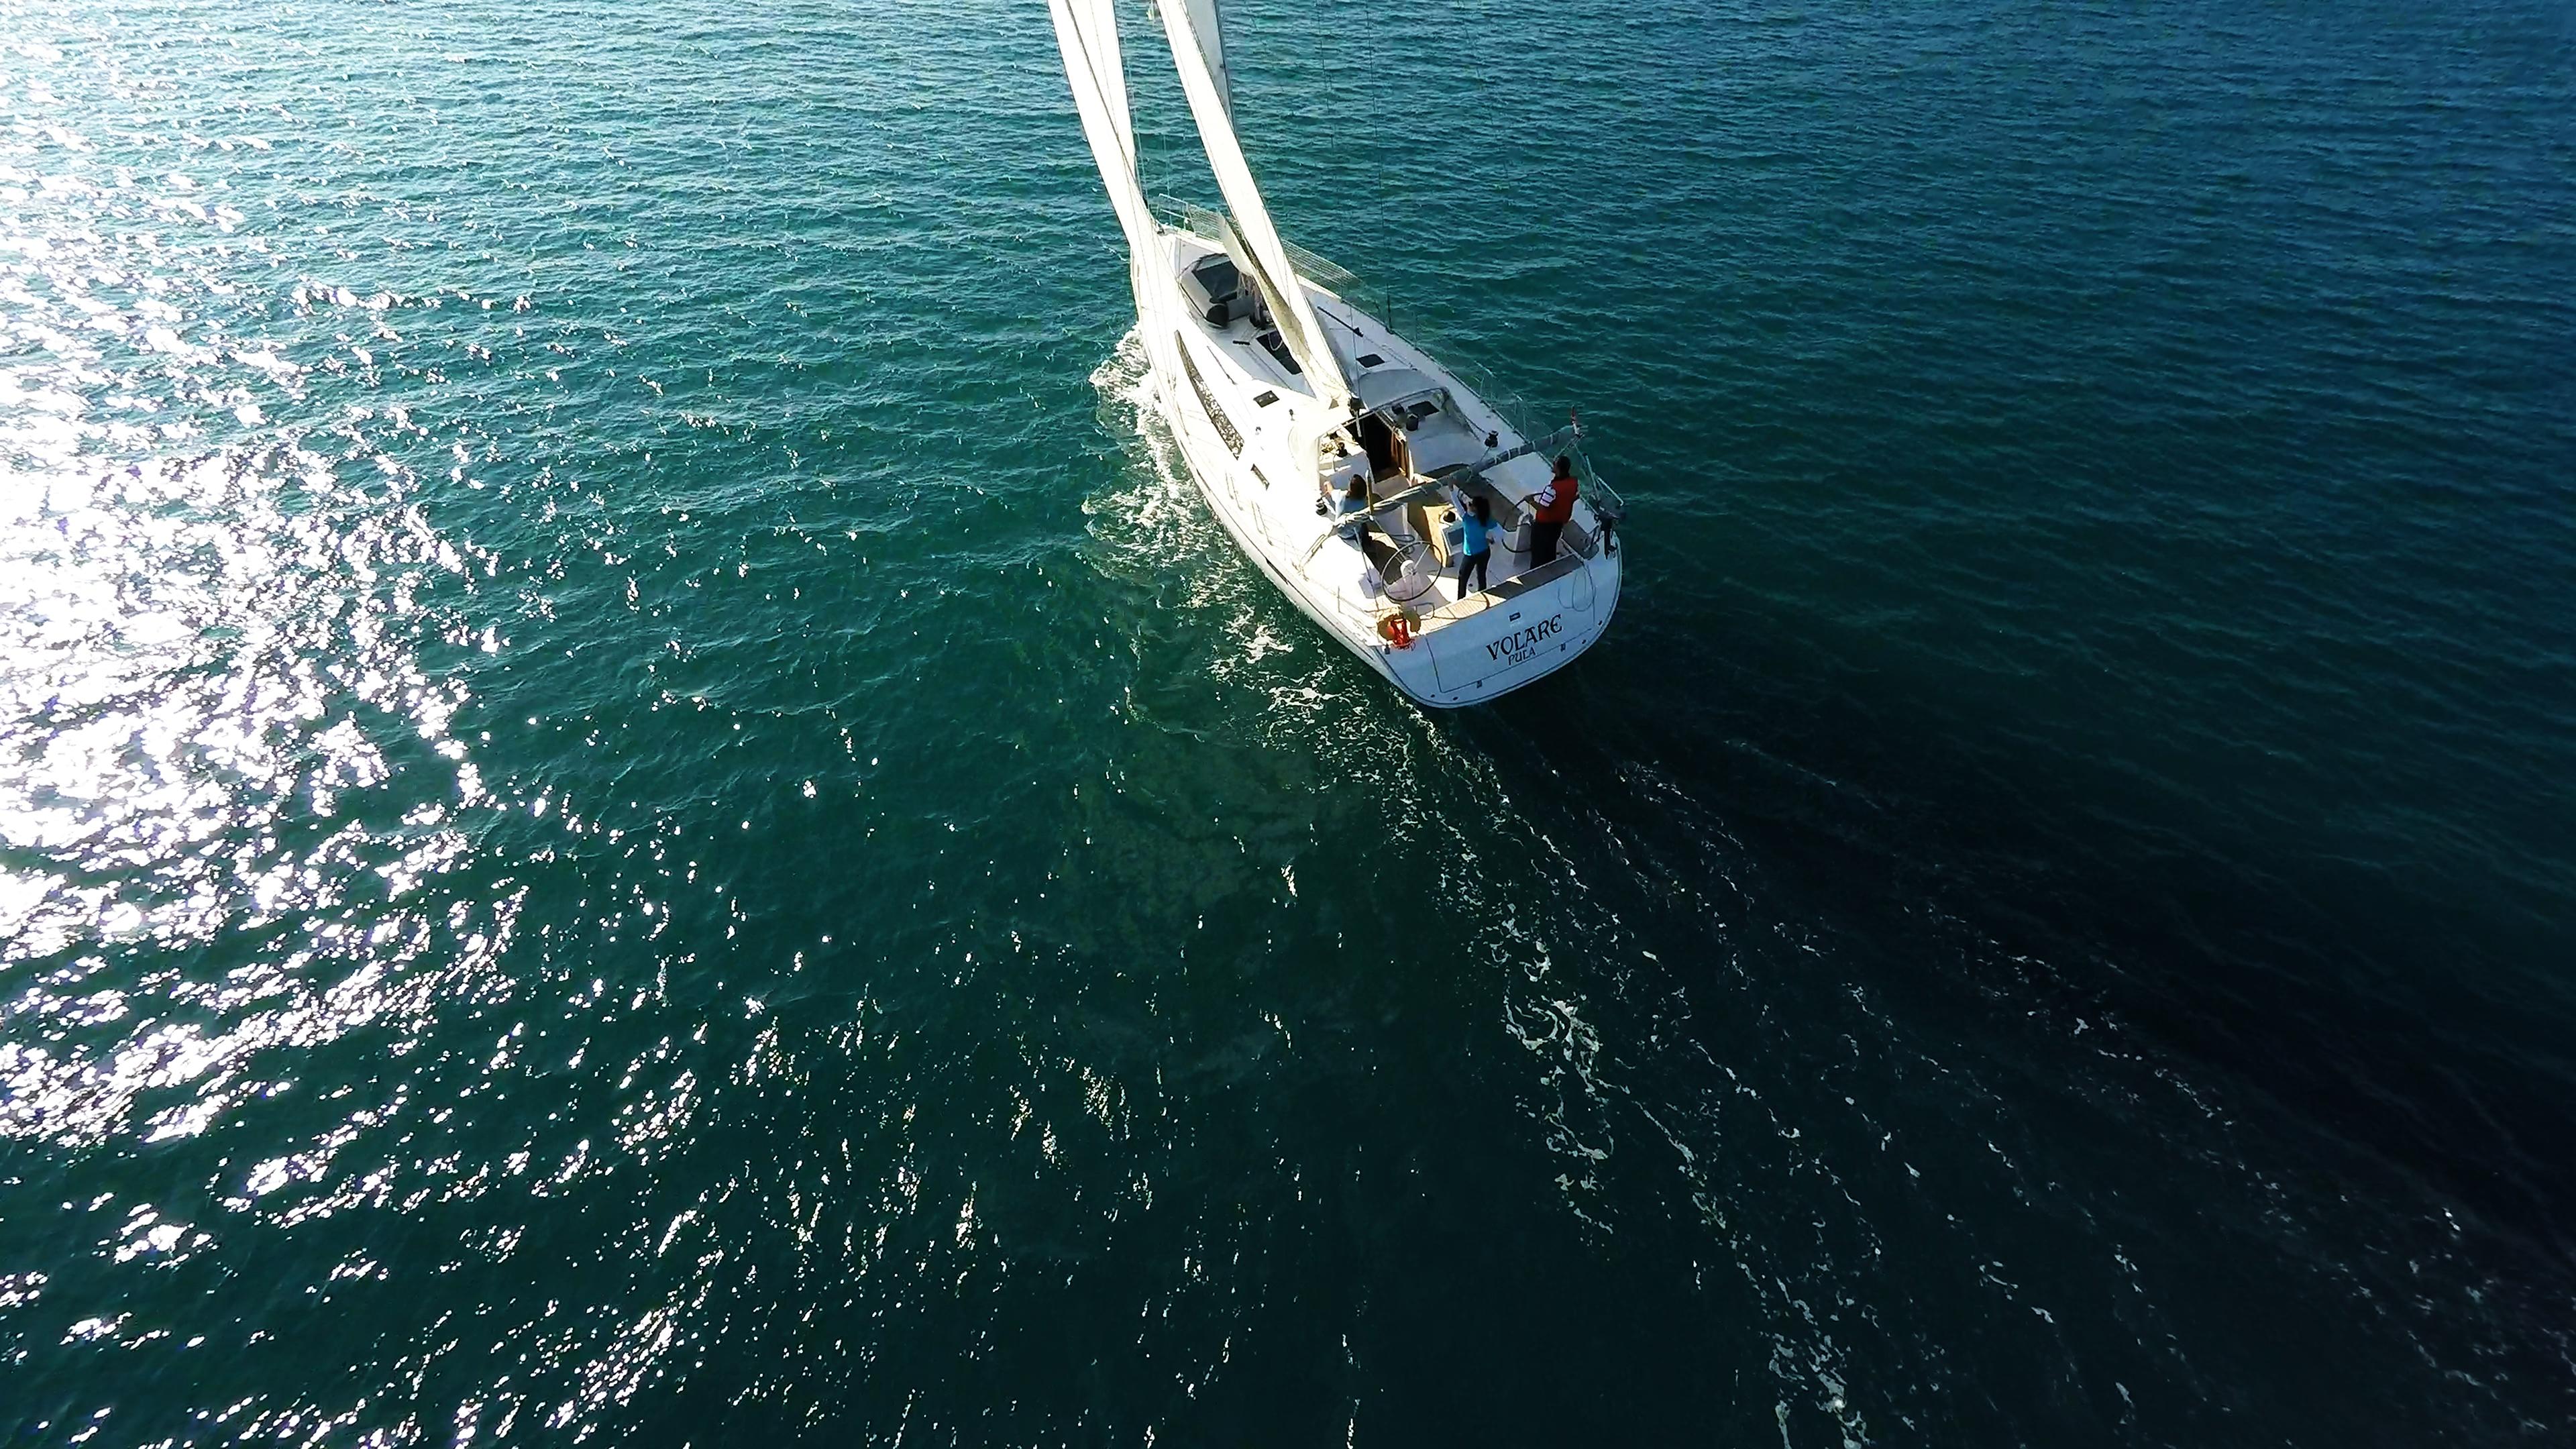 barcha a vela barca a vela yacht a vela vento